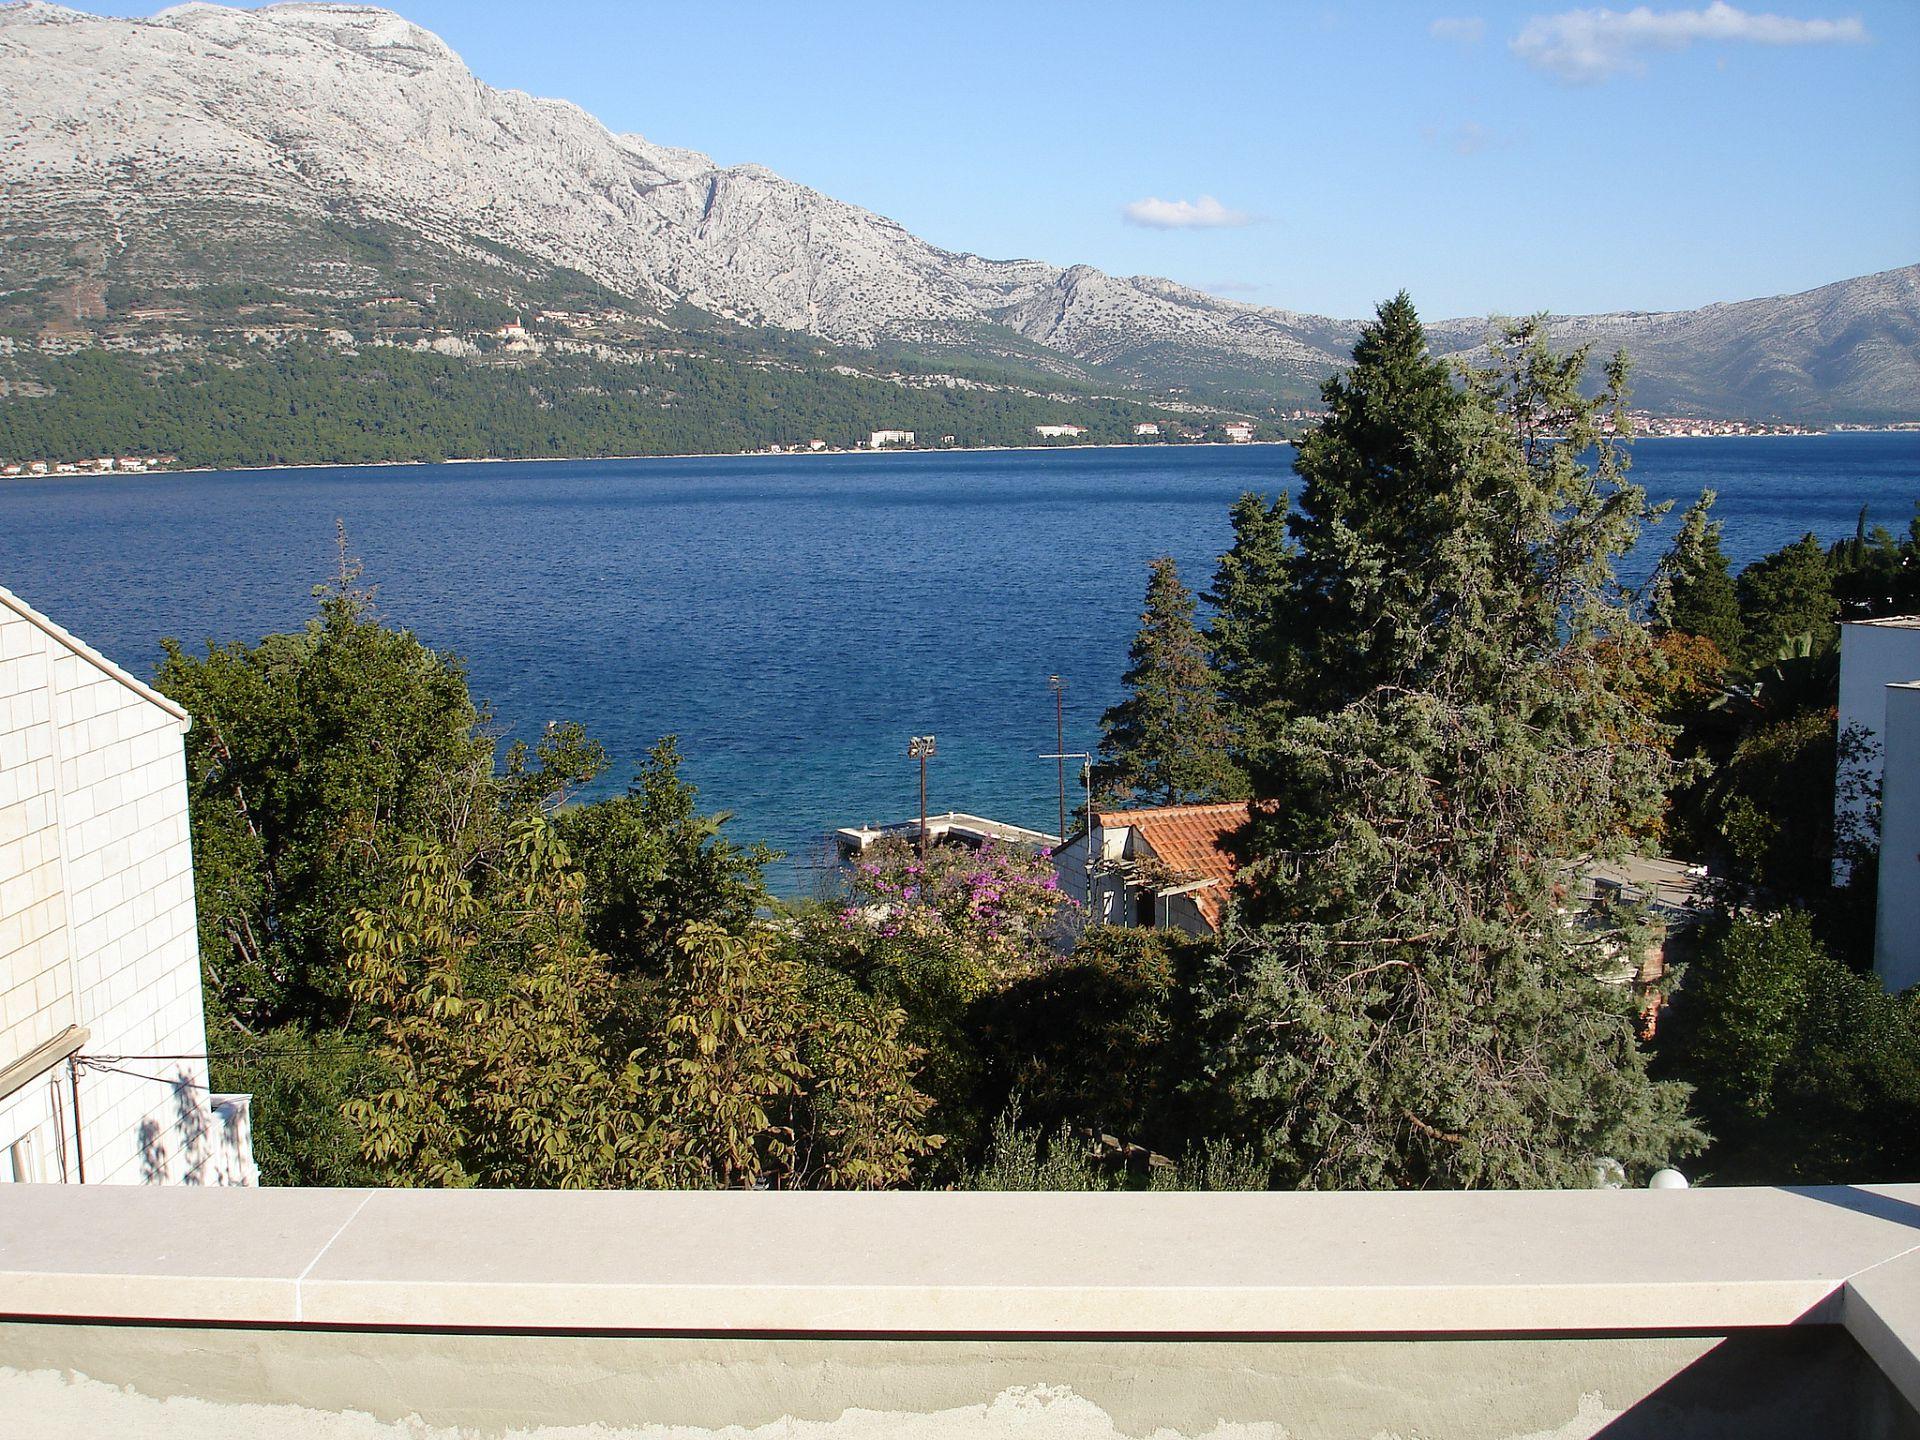 Ferienwohnung Ankica SA1(2) - Korcula (739749), Korčula, Insel Korcula, Dalmatien, Kroatien, Bild 5